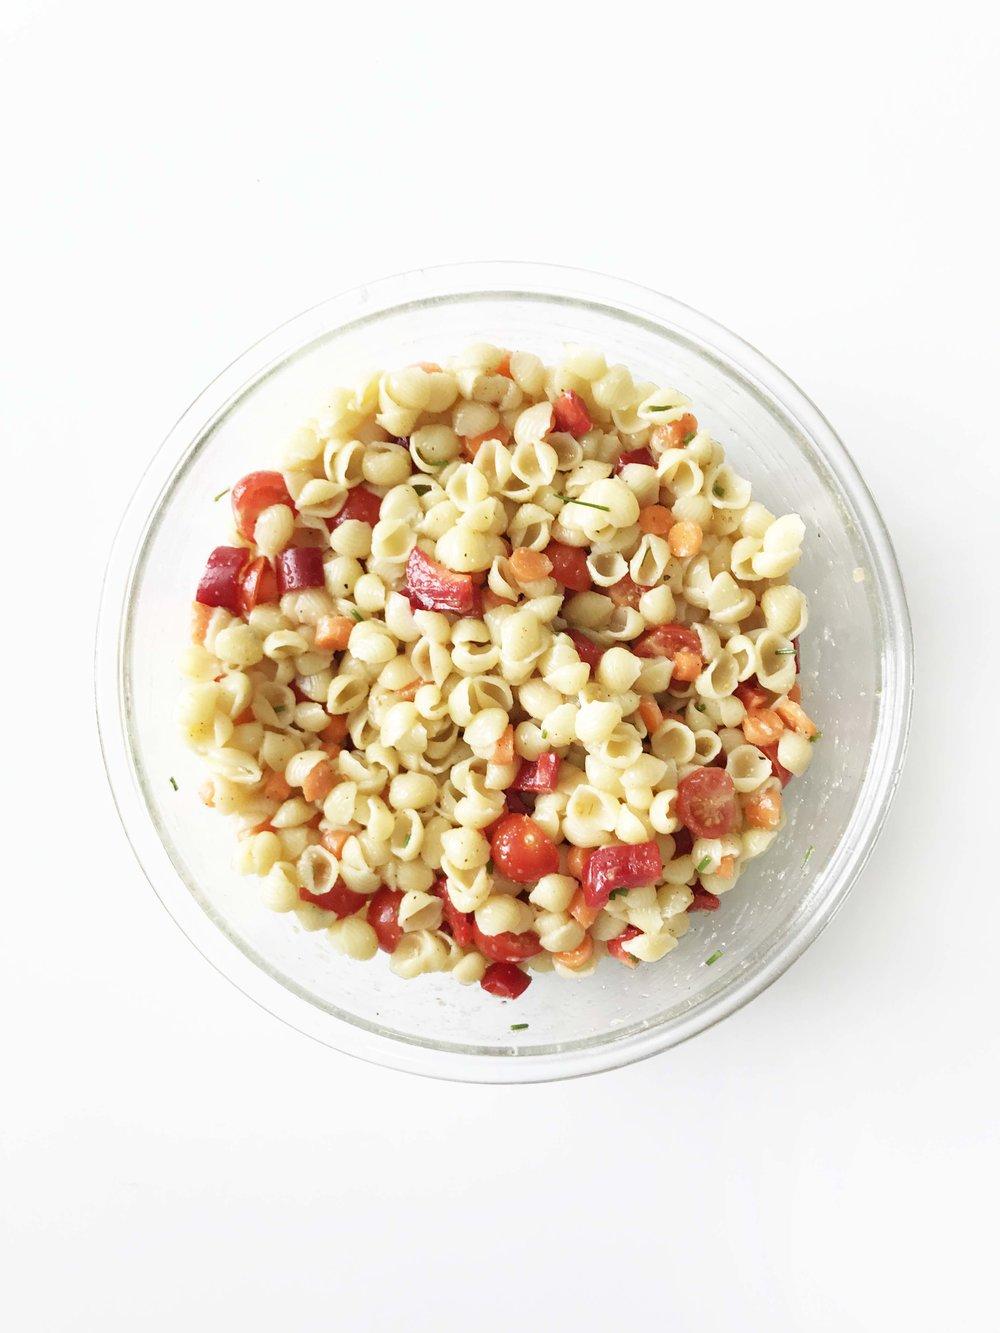 seashell-pasta-salad3.jpg